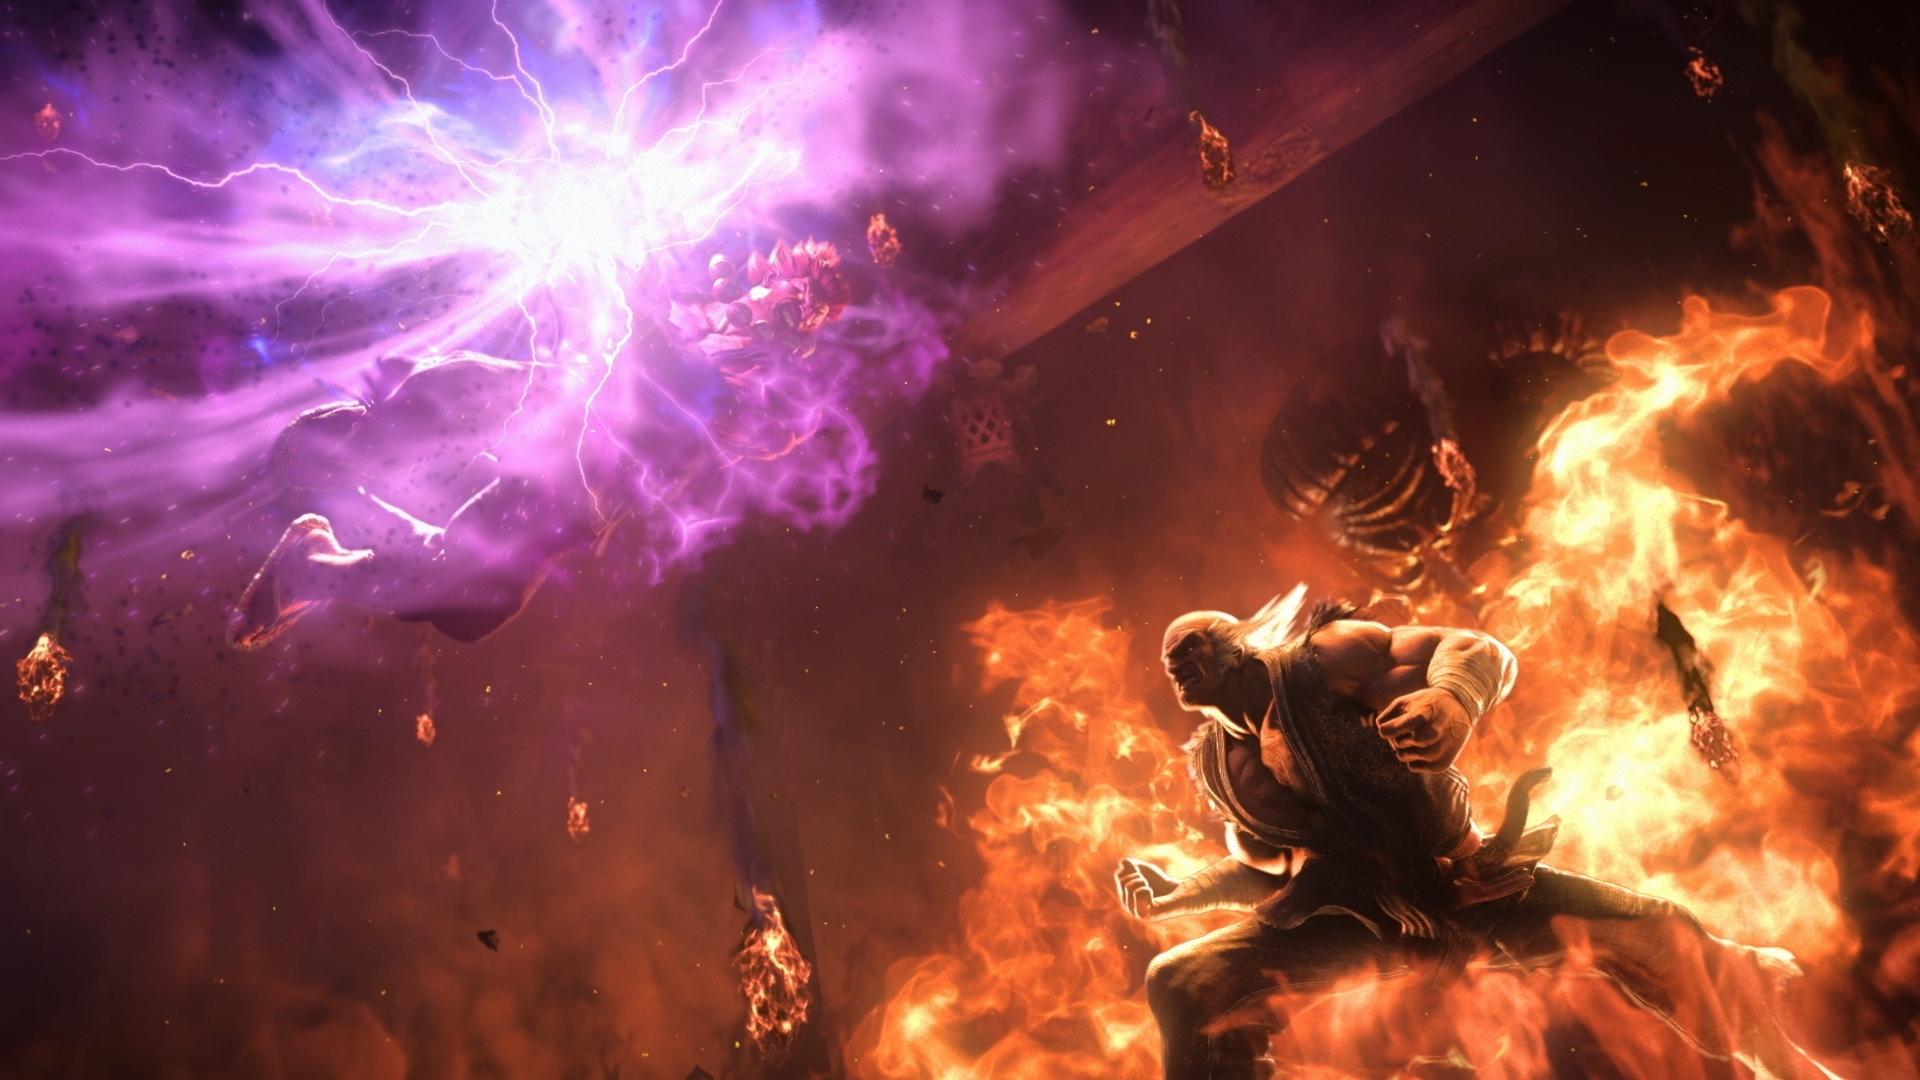 Tekken 7 Full HD Wallpaper